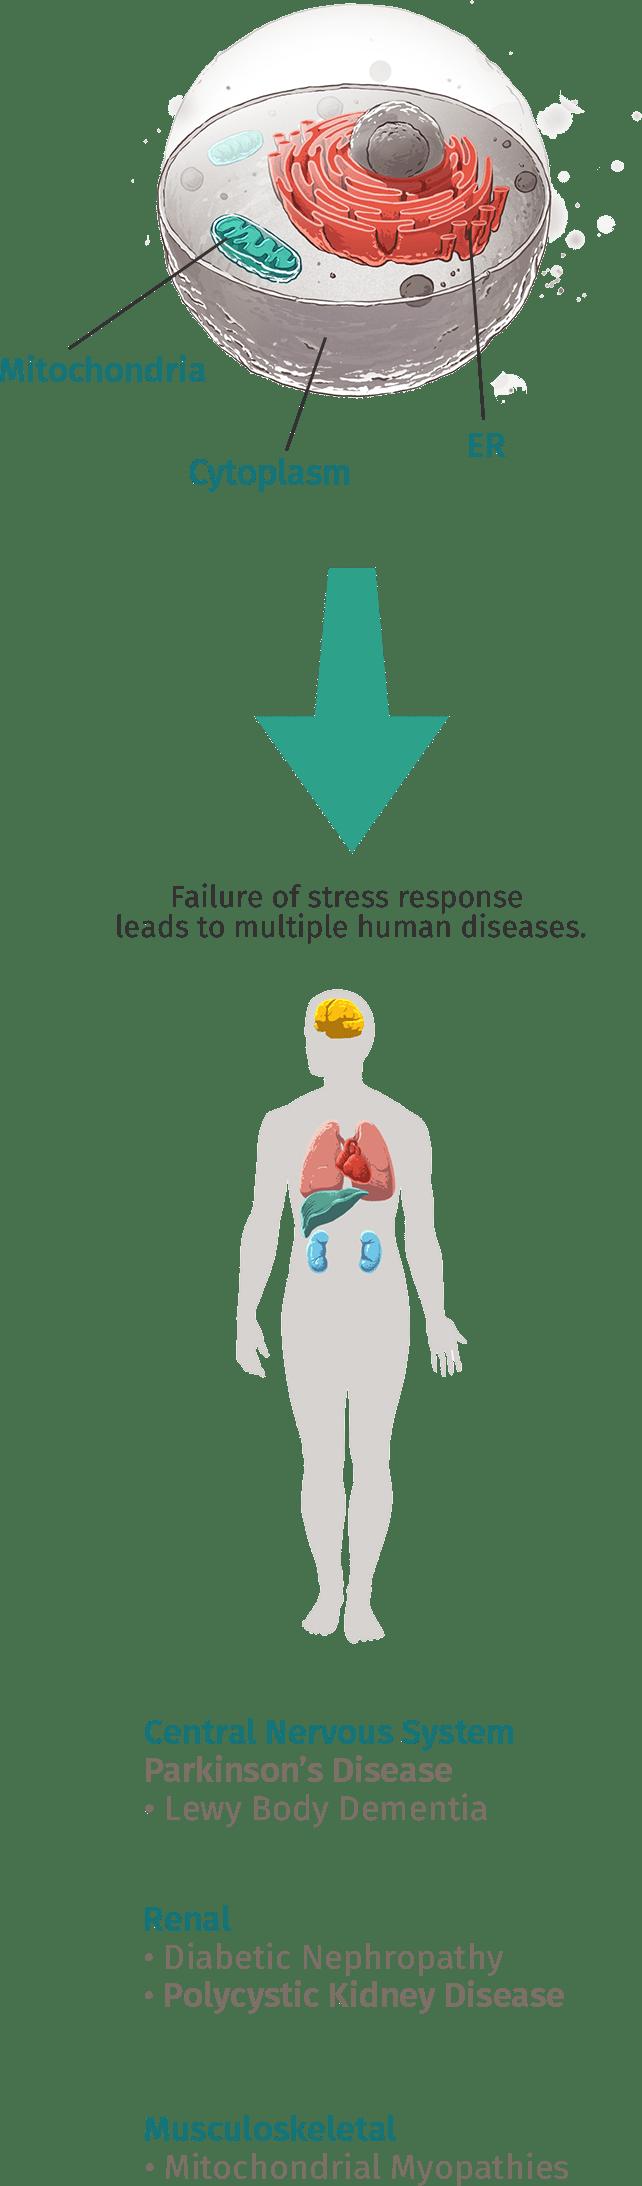 Cellular Stress Response